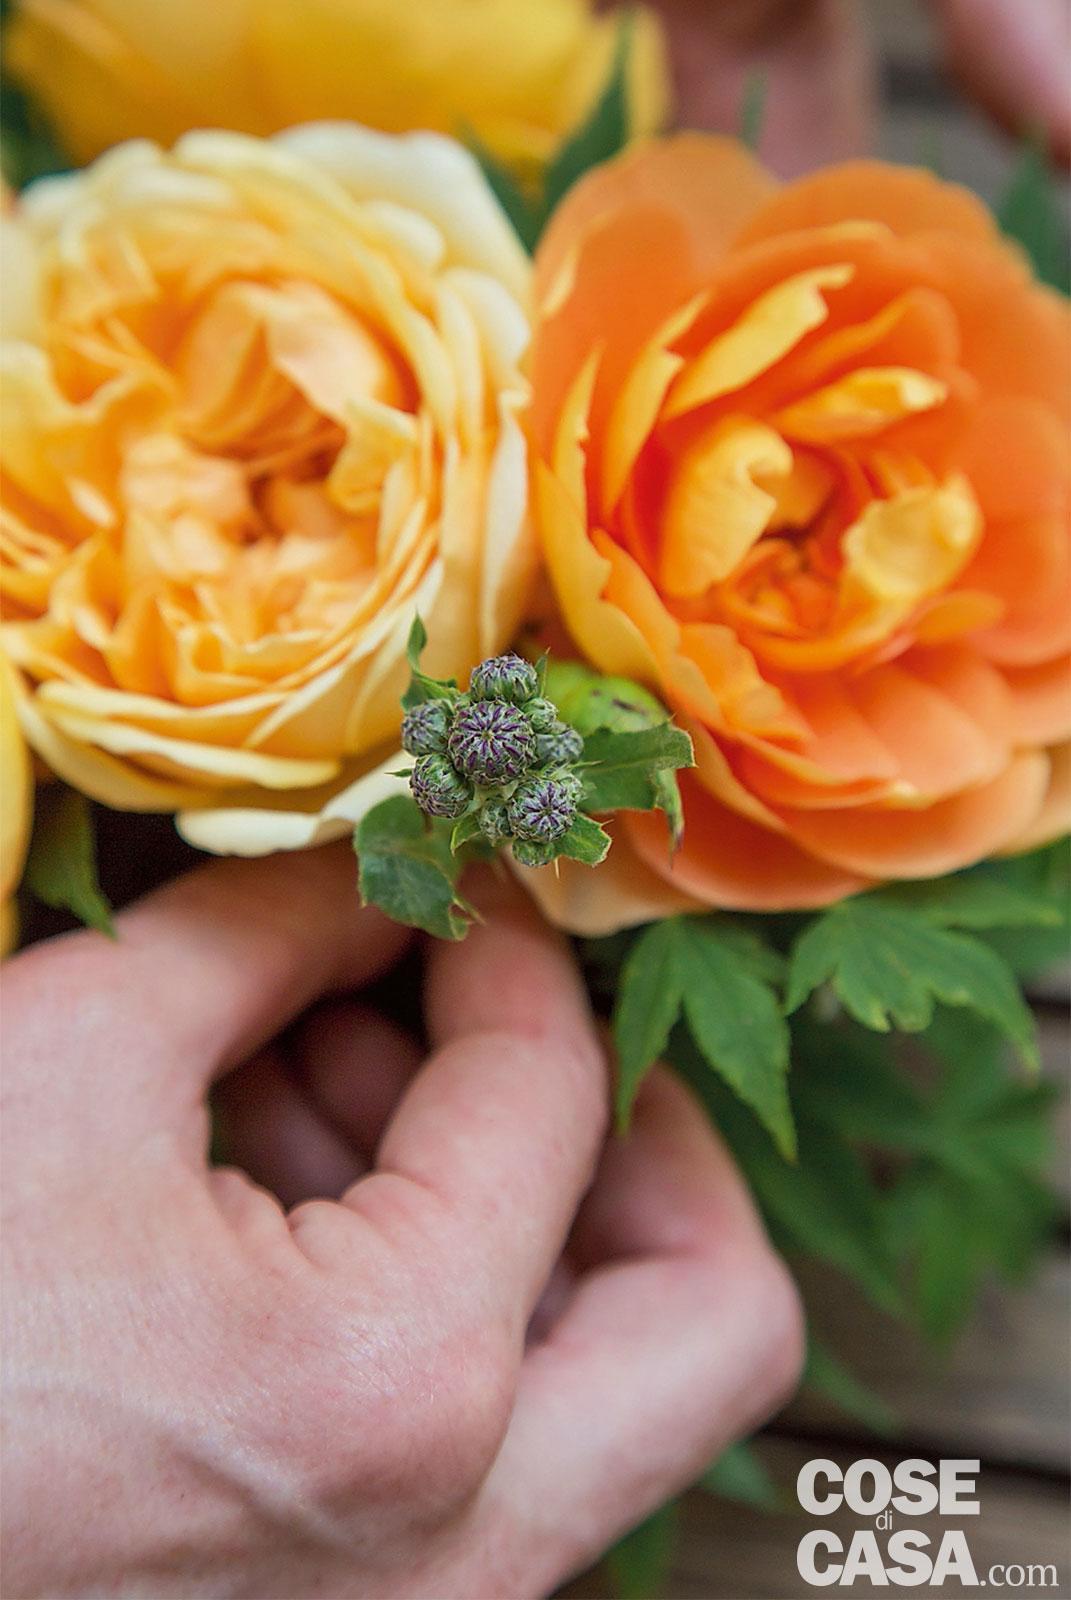 Rose Fai Da Te fiori in tazza: un fai da te con rose, foglie e frutti